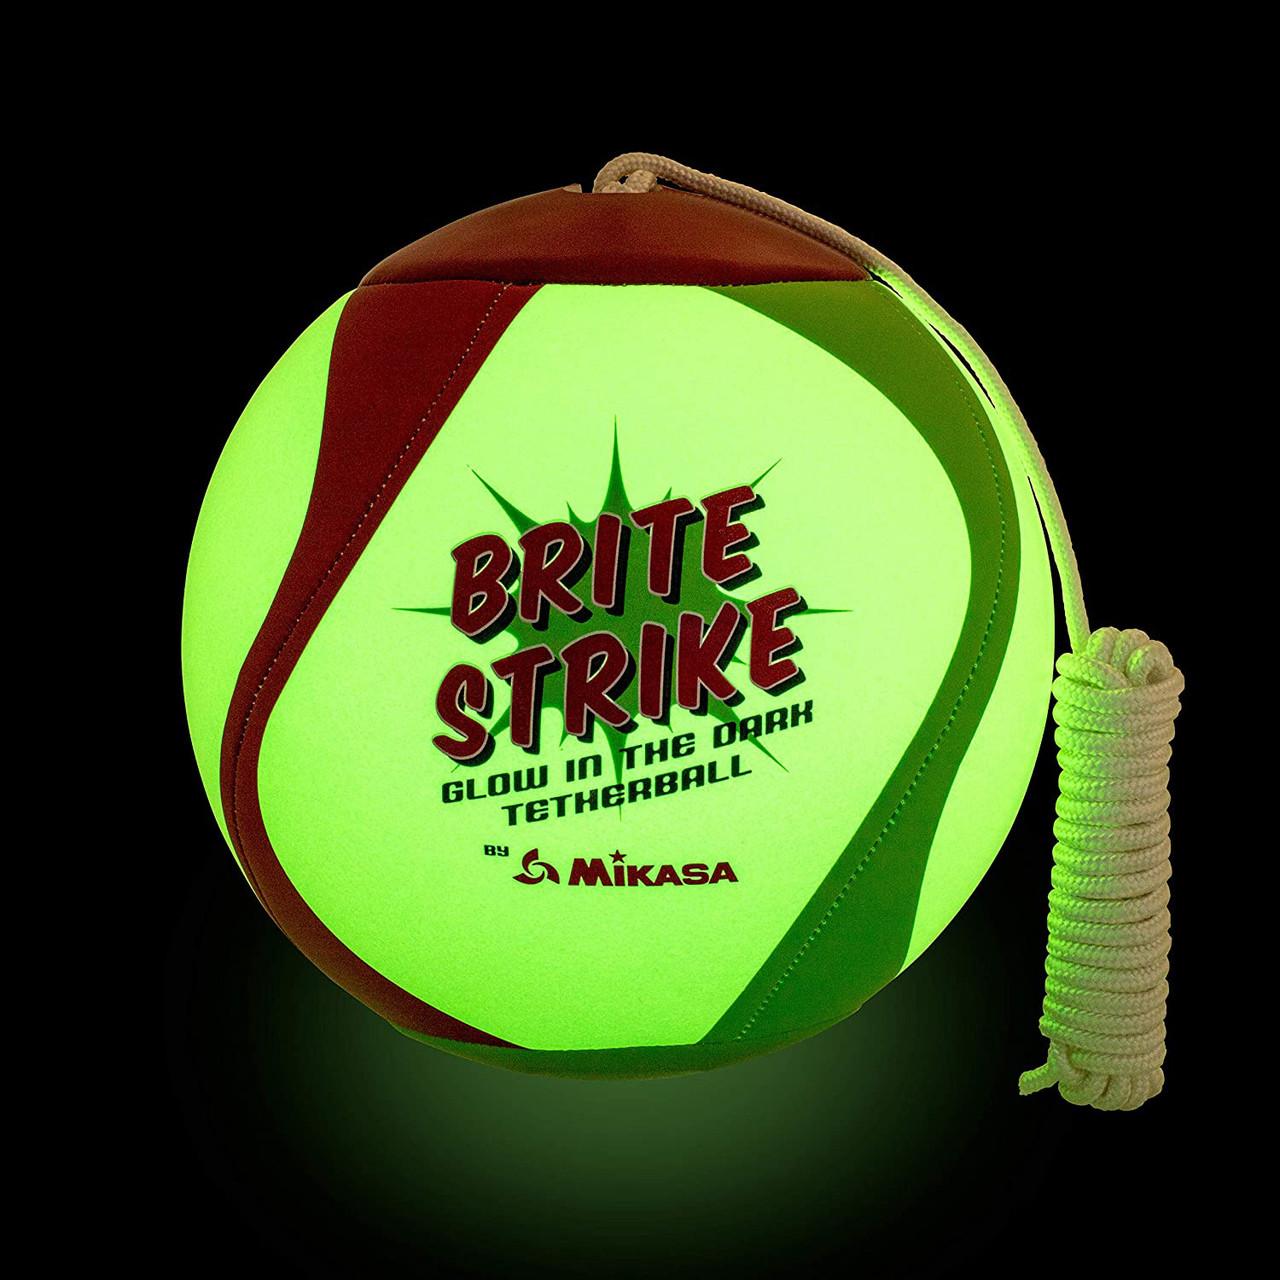 Mikasa Brite Strike Glow in the Dark Tetherball